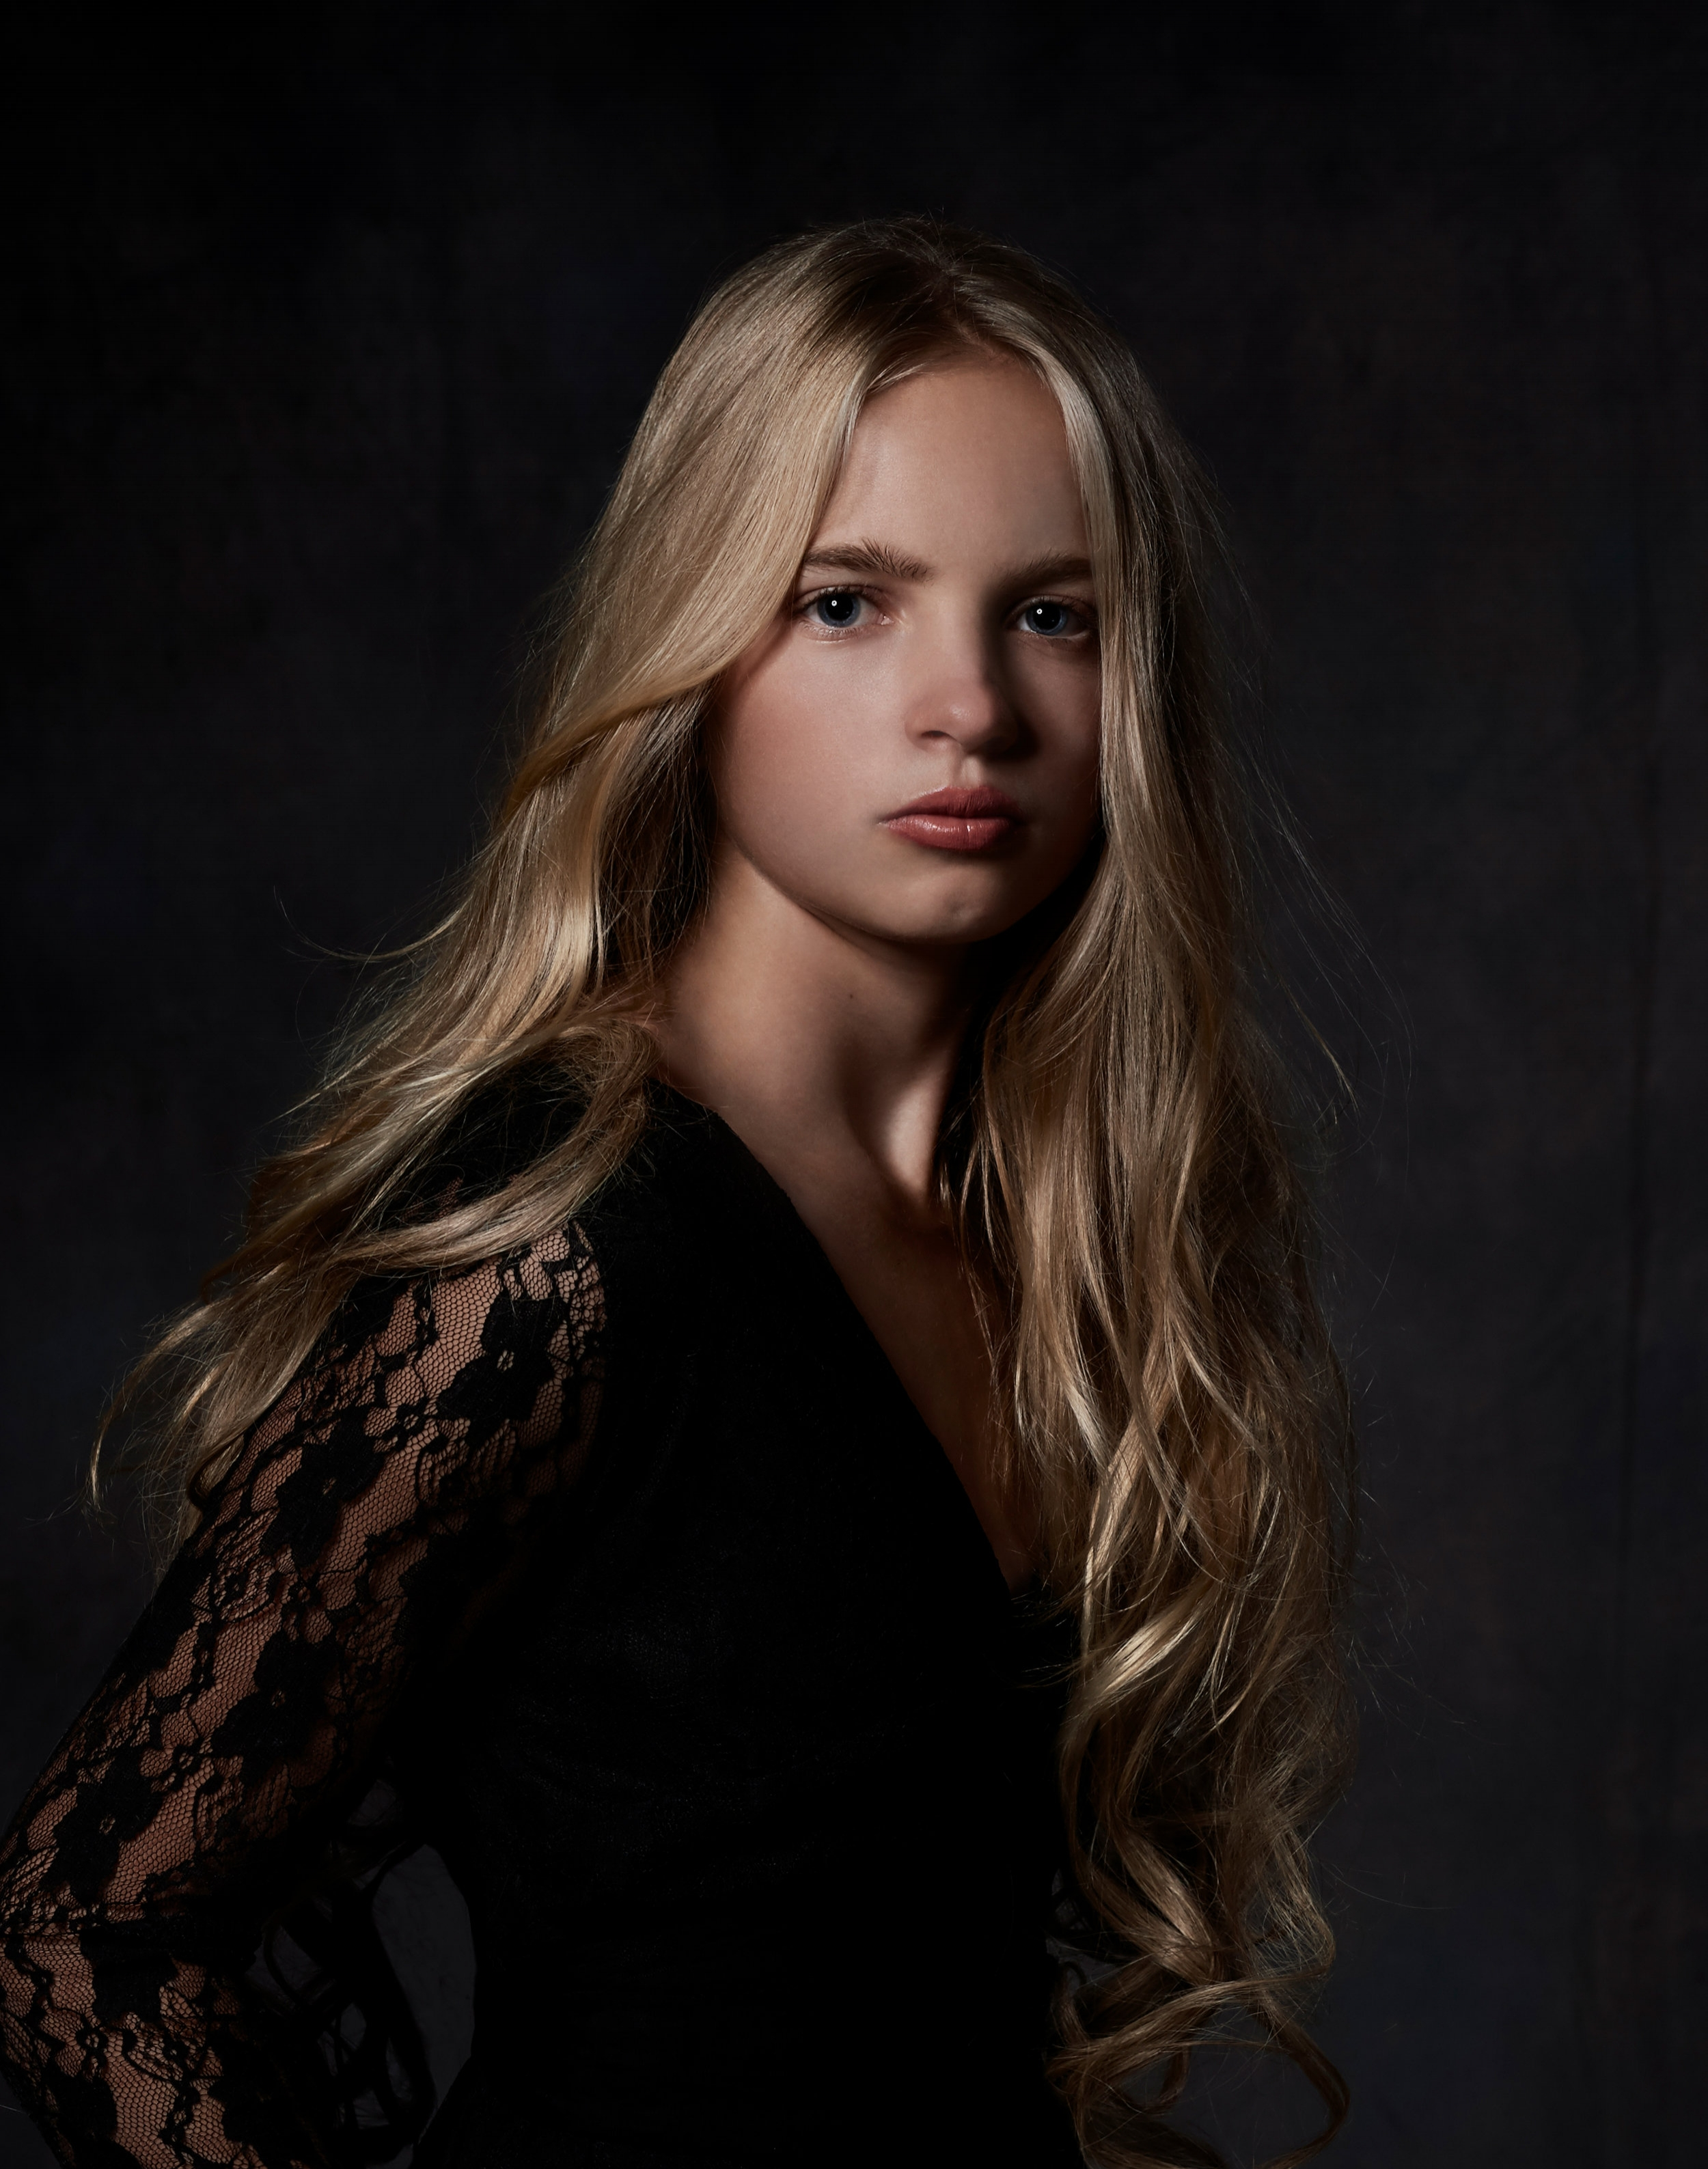 Classical-Portraiture-Marta-Hewson-teen.jpg